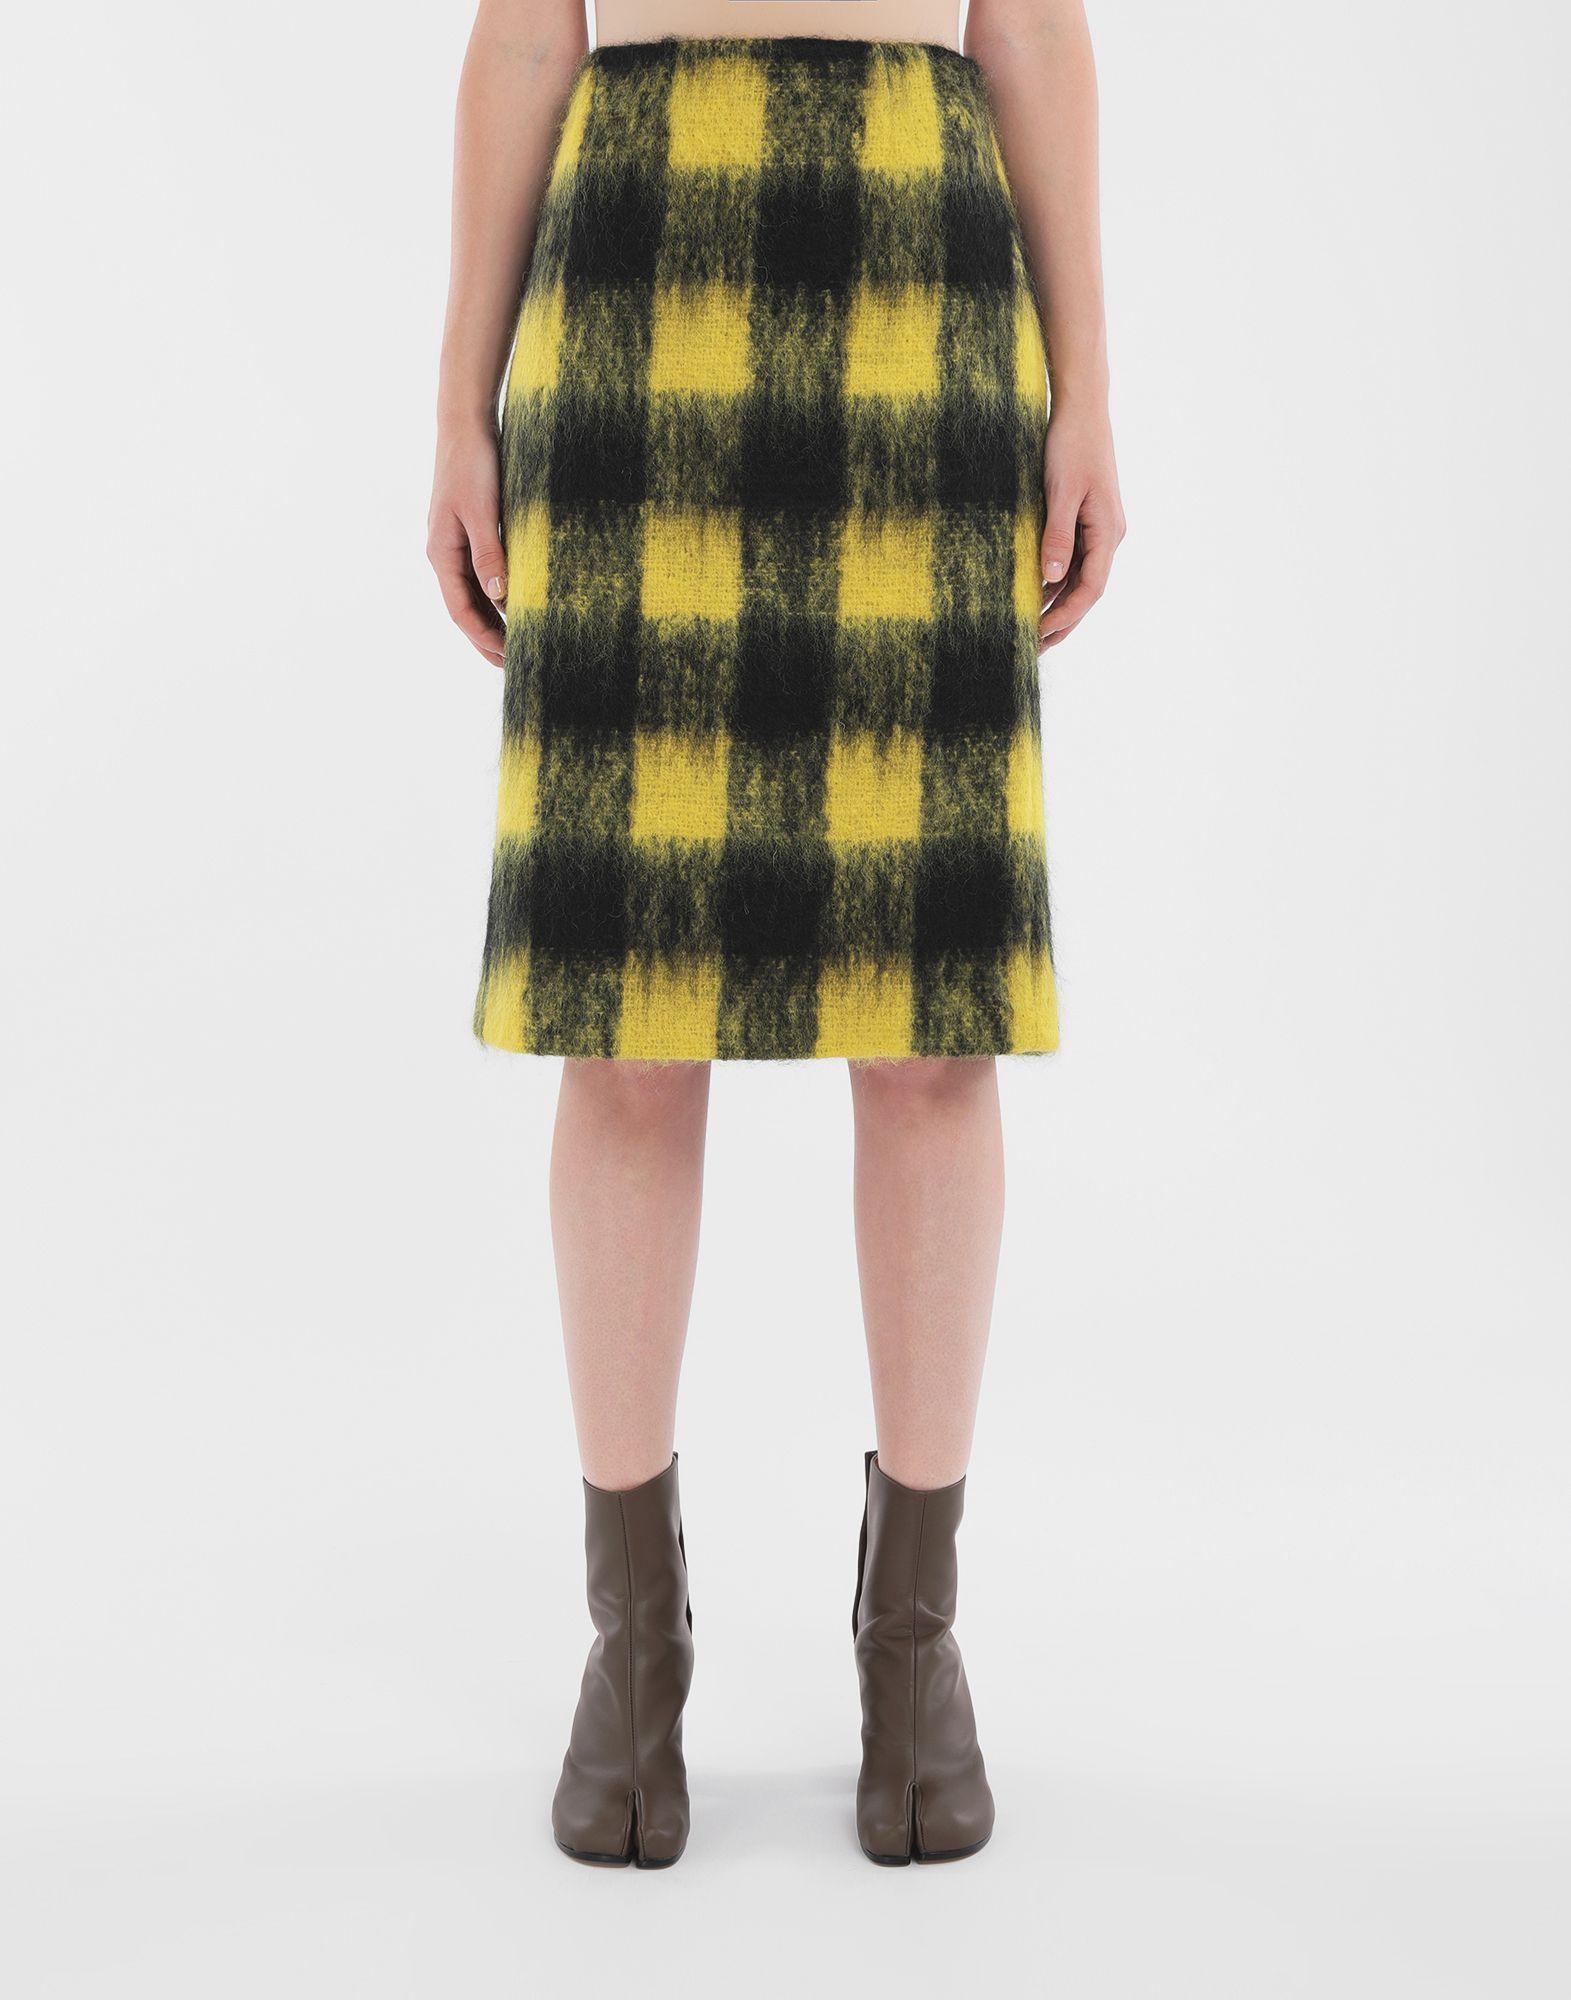 MAISON MARGIELA Mohair check skirt Skirt Woman r